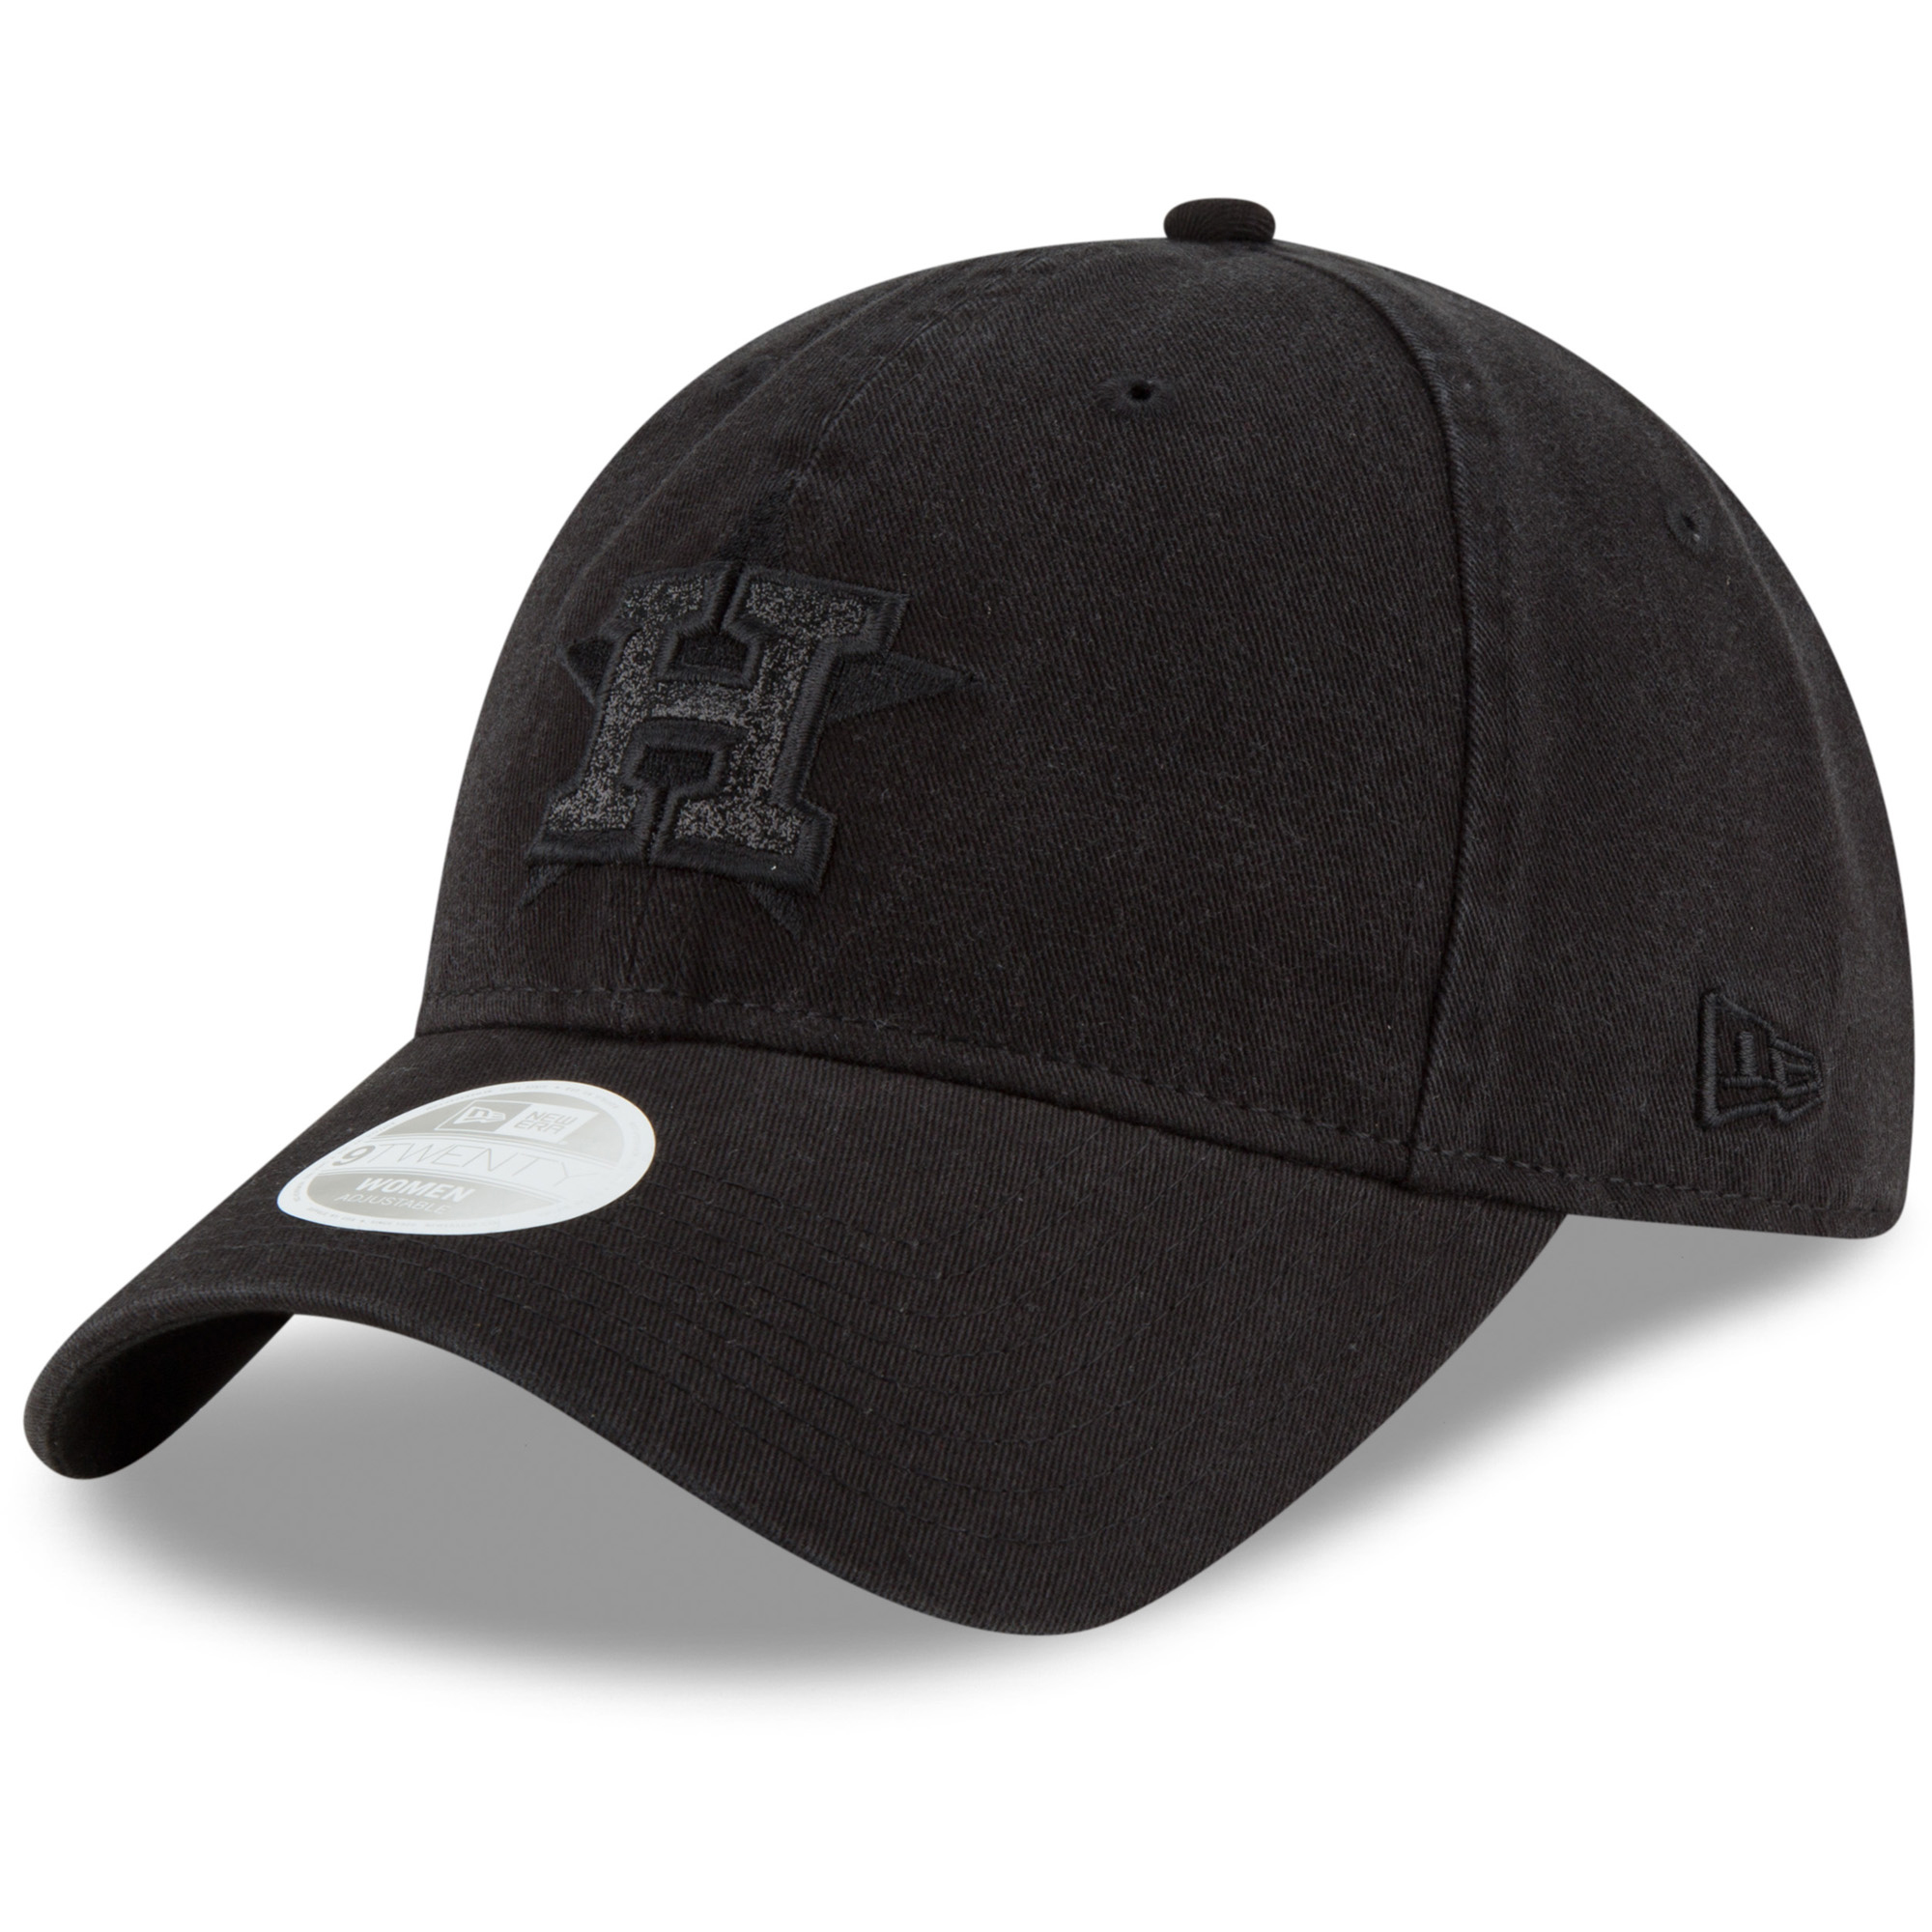 Houston Astros New Era Women's Team Logo Glisten 9TWENTY Adjustable Hat - Black - OSFA